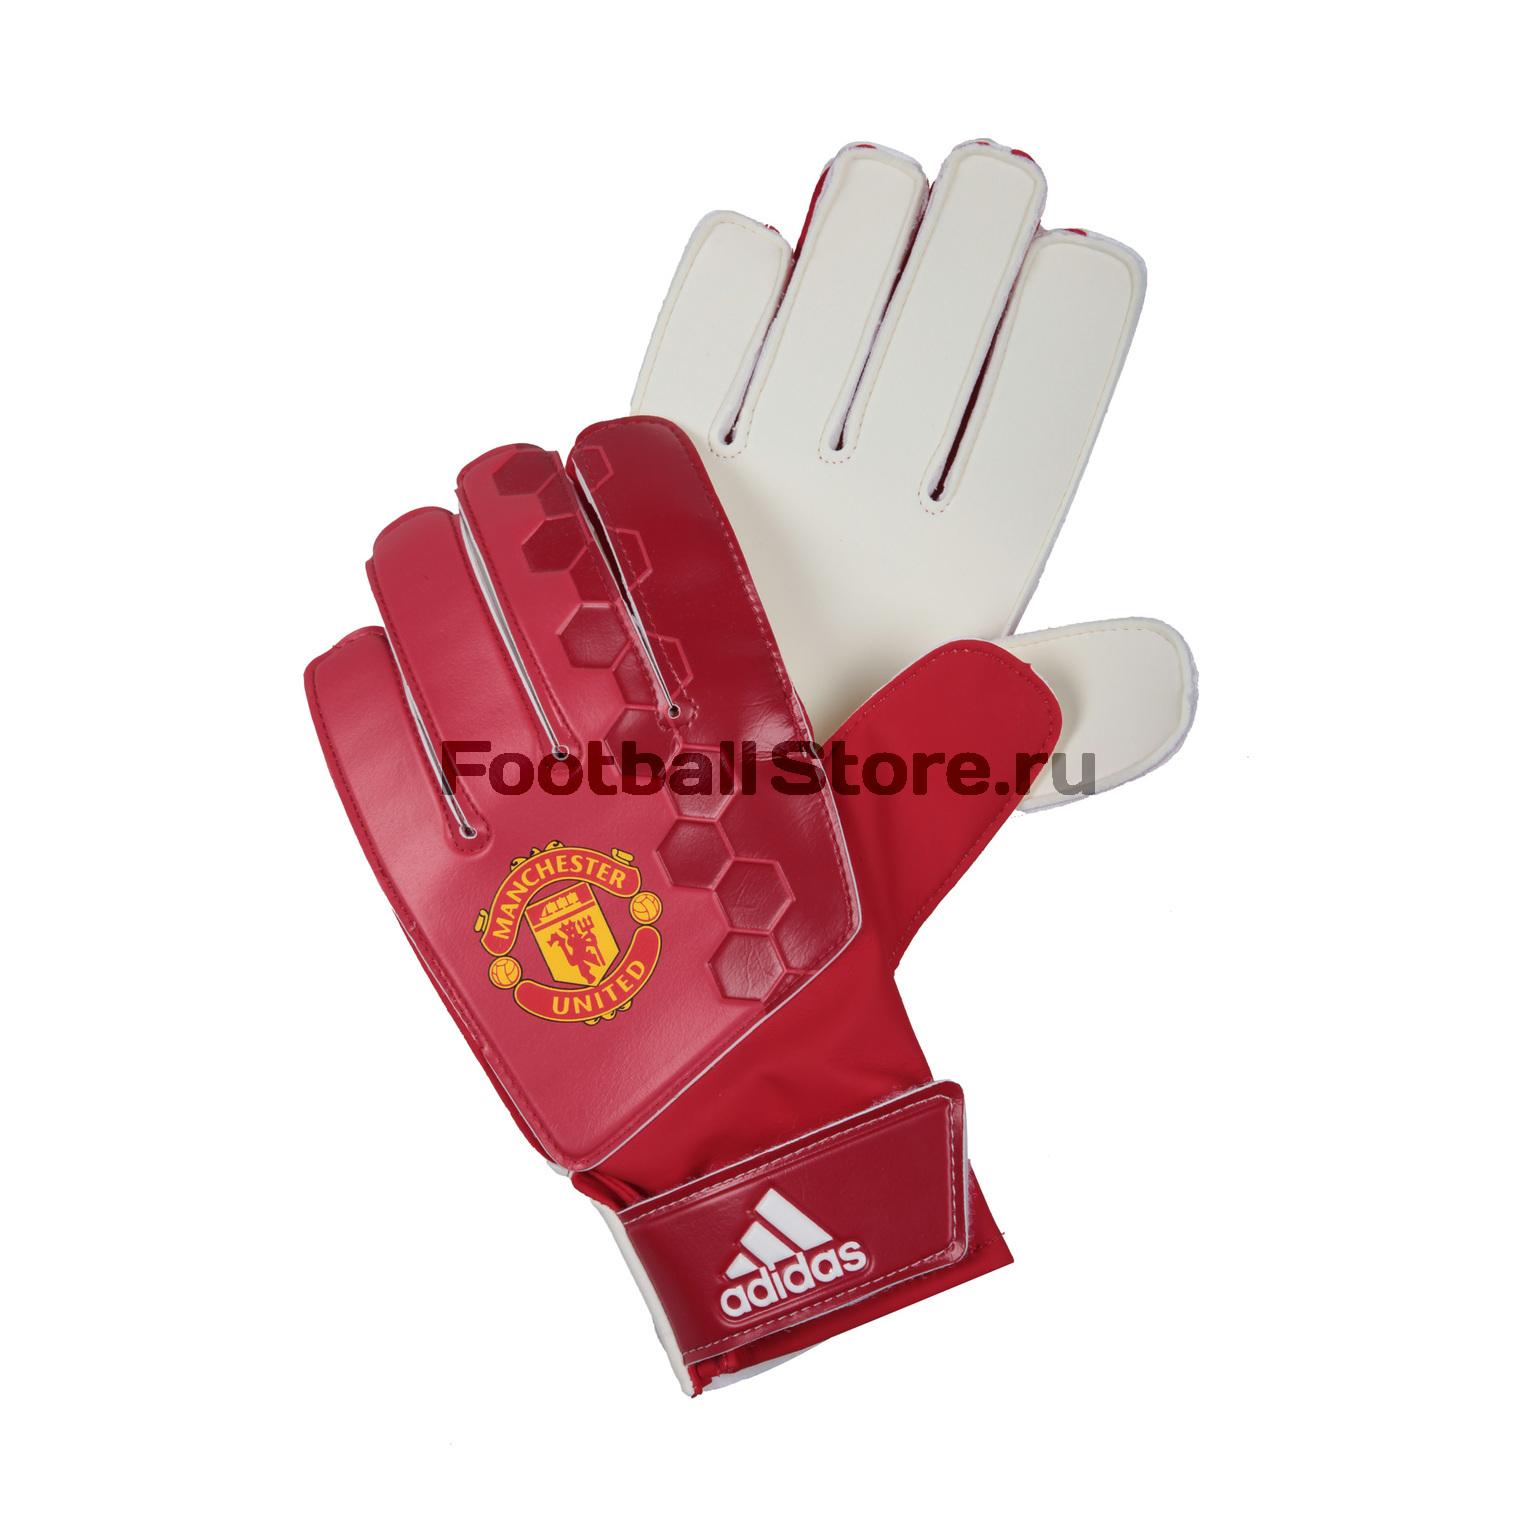 Перчатки вратарские Adidas Manchester United AP7019 сумка adidas manchester united 2018 19